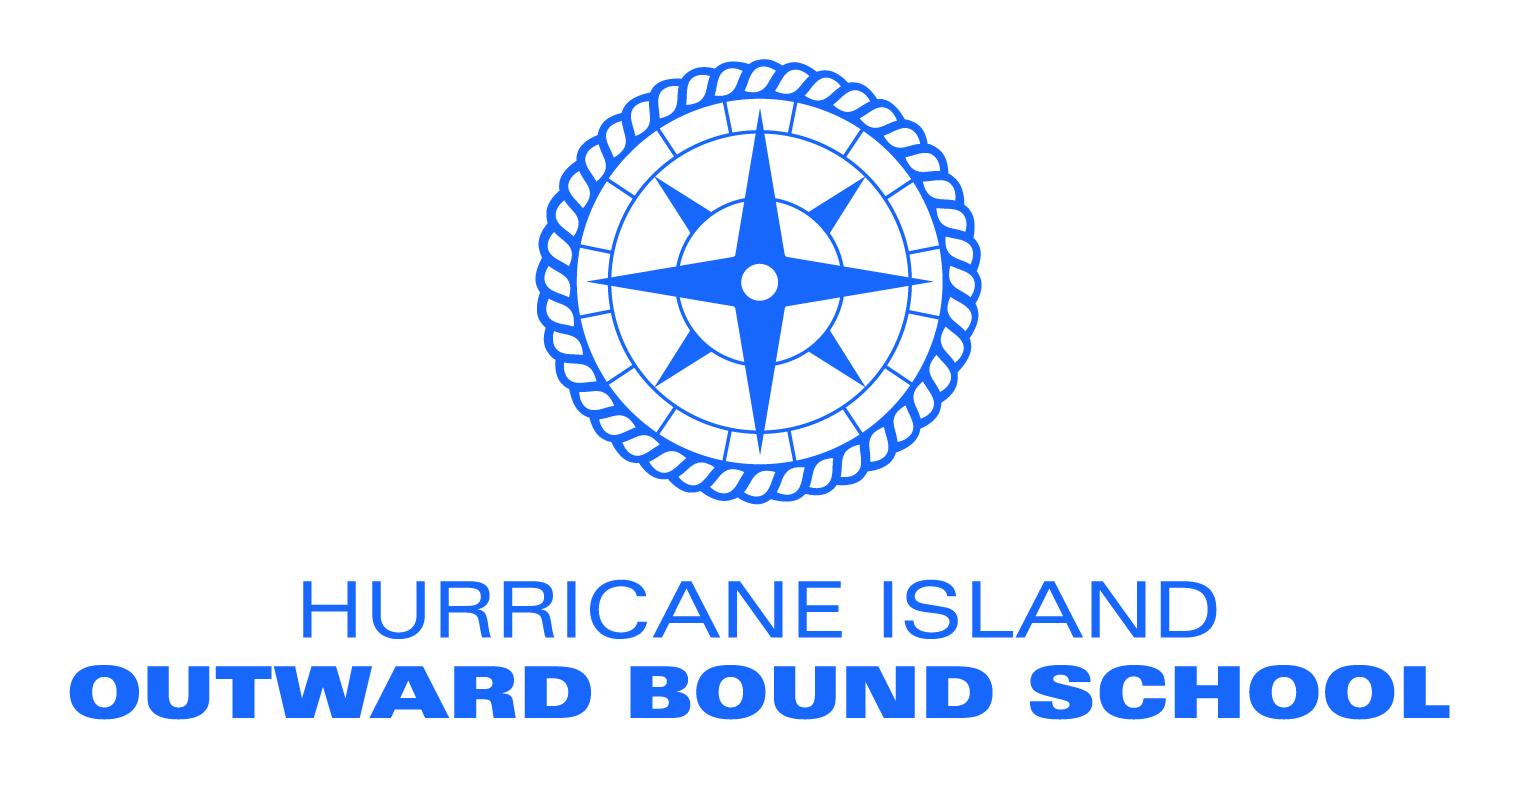 hurricane island outward bound school Phone number, address, website, statistics, and other information for hurricane island outward bound, a public high school located in key largo, fl.